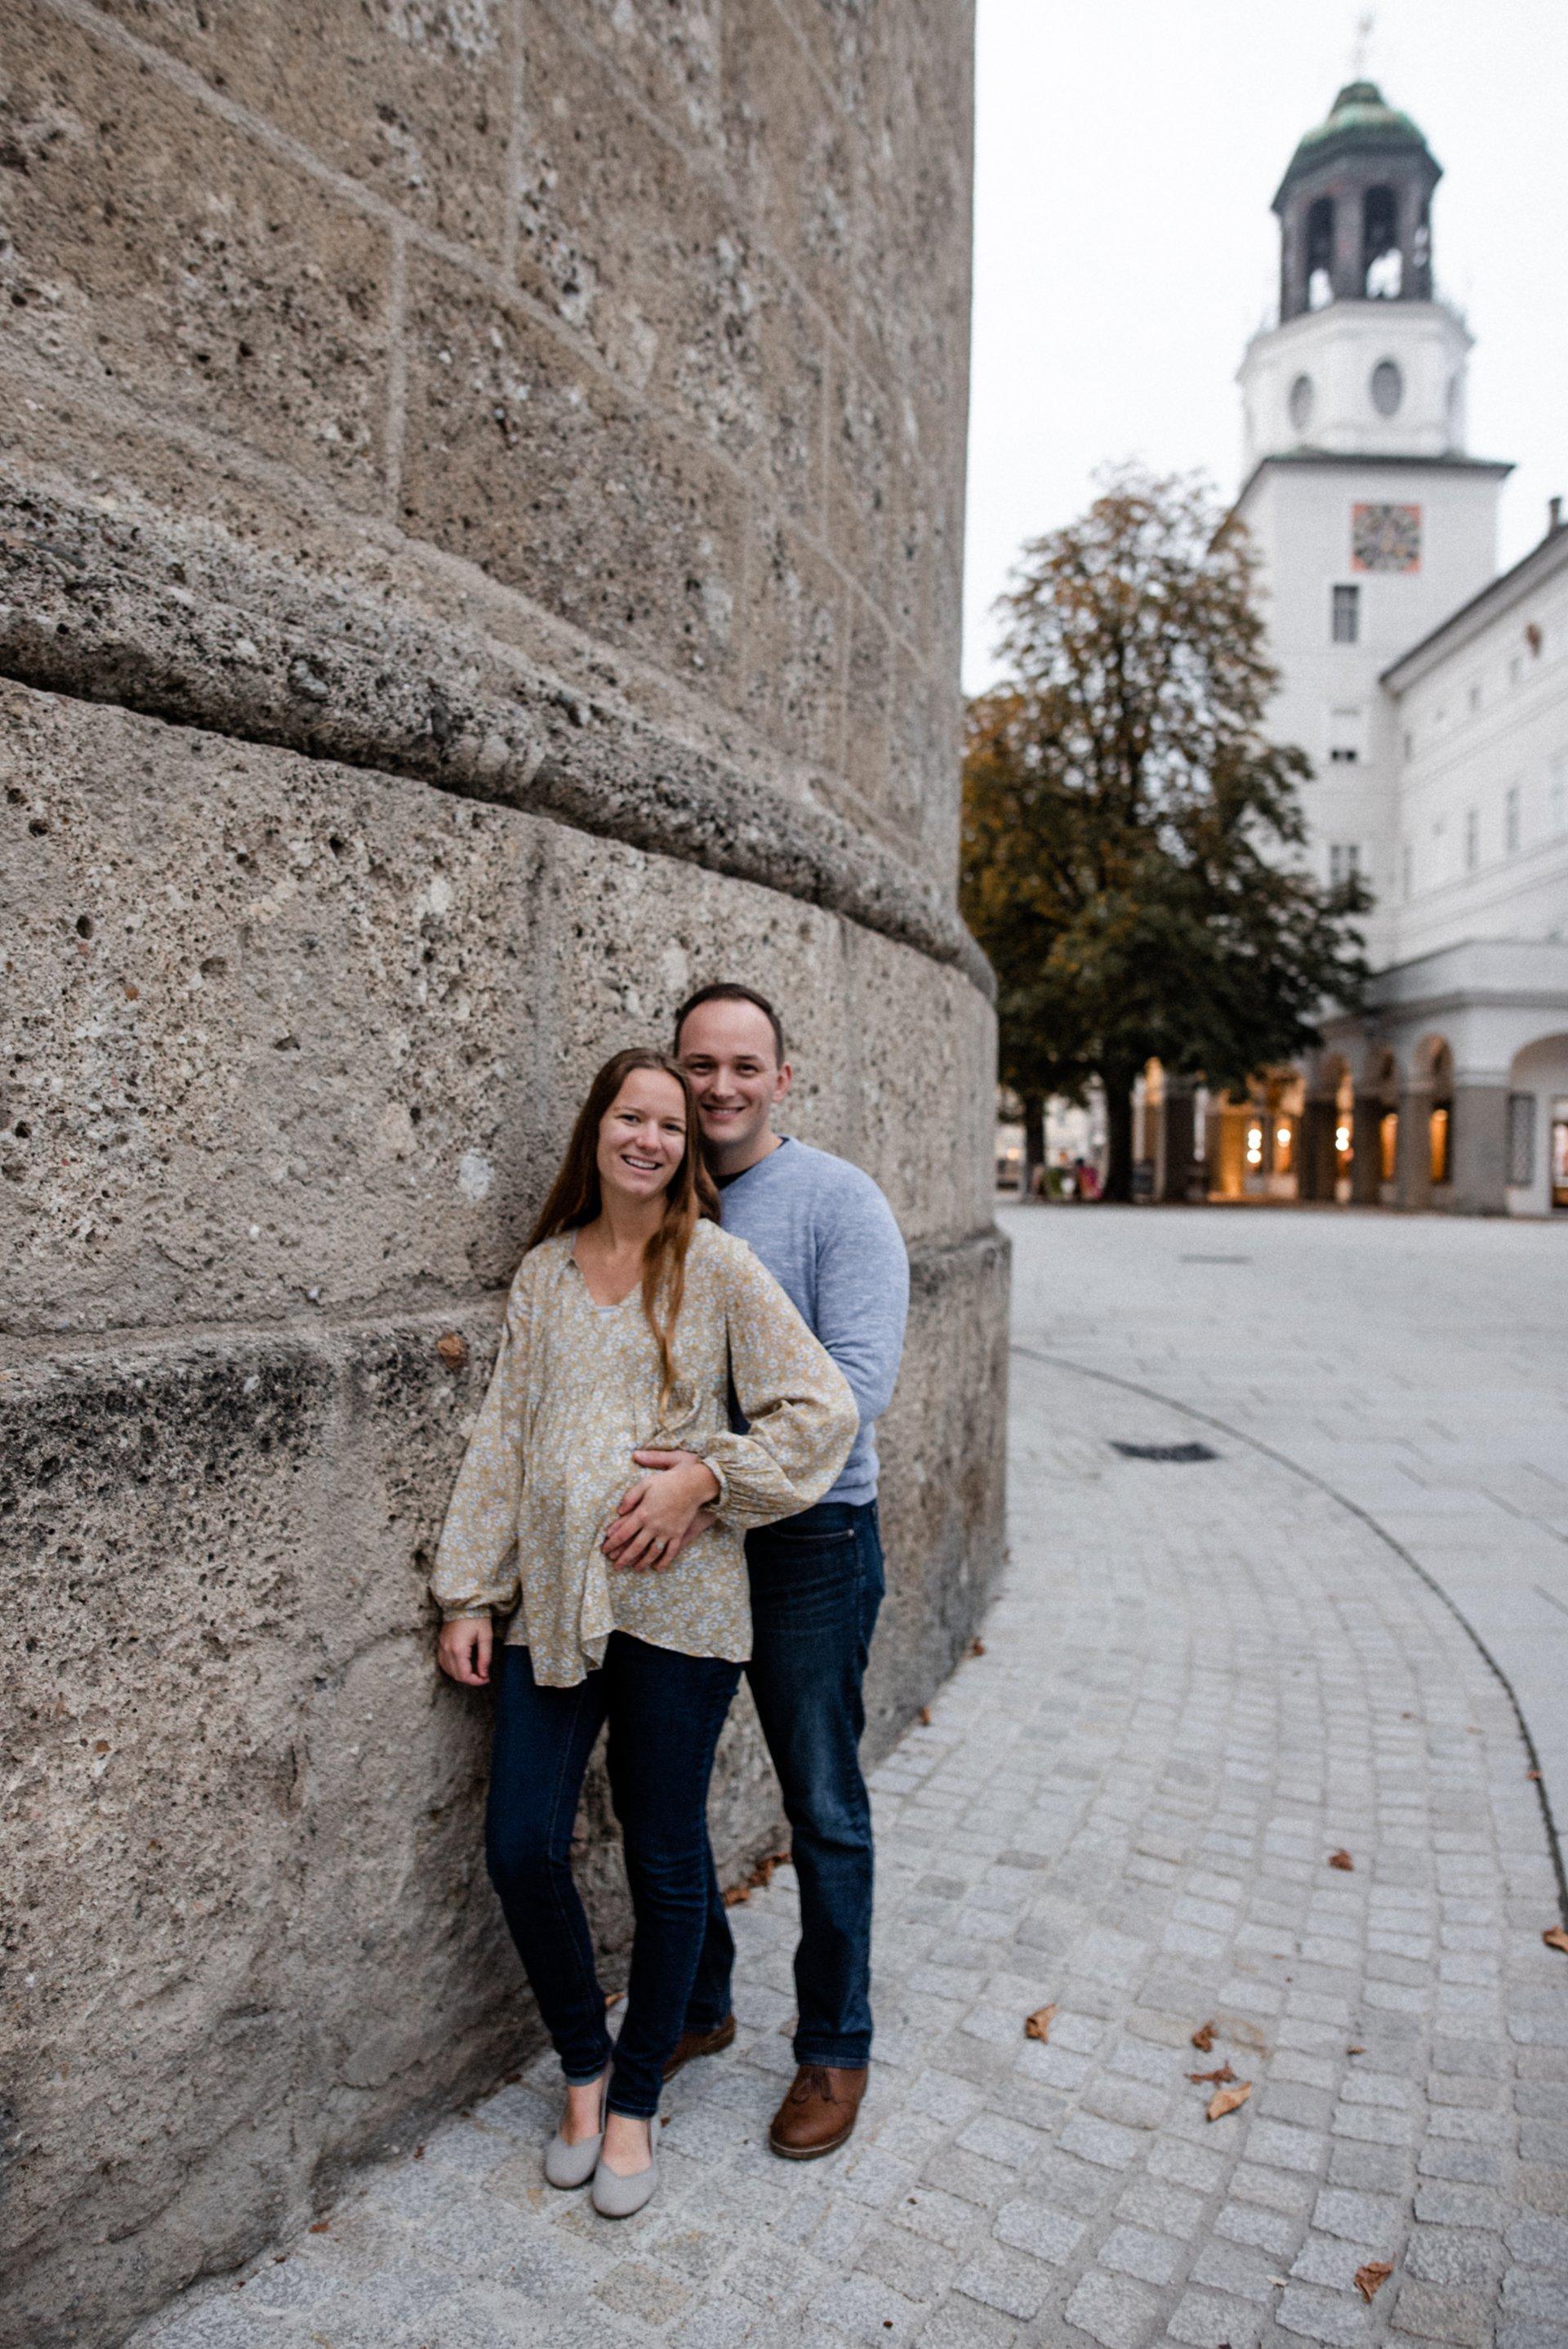 Salzburg-Austria-travel-story-Flytographer-8